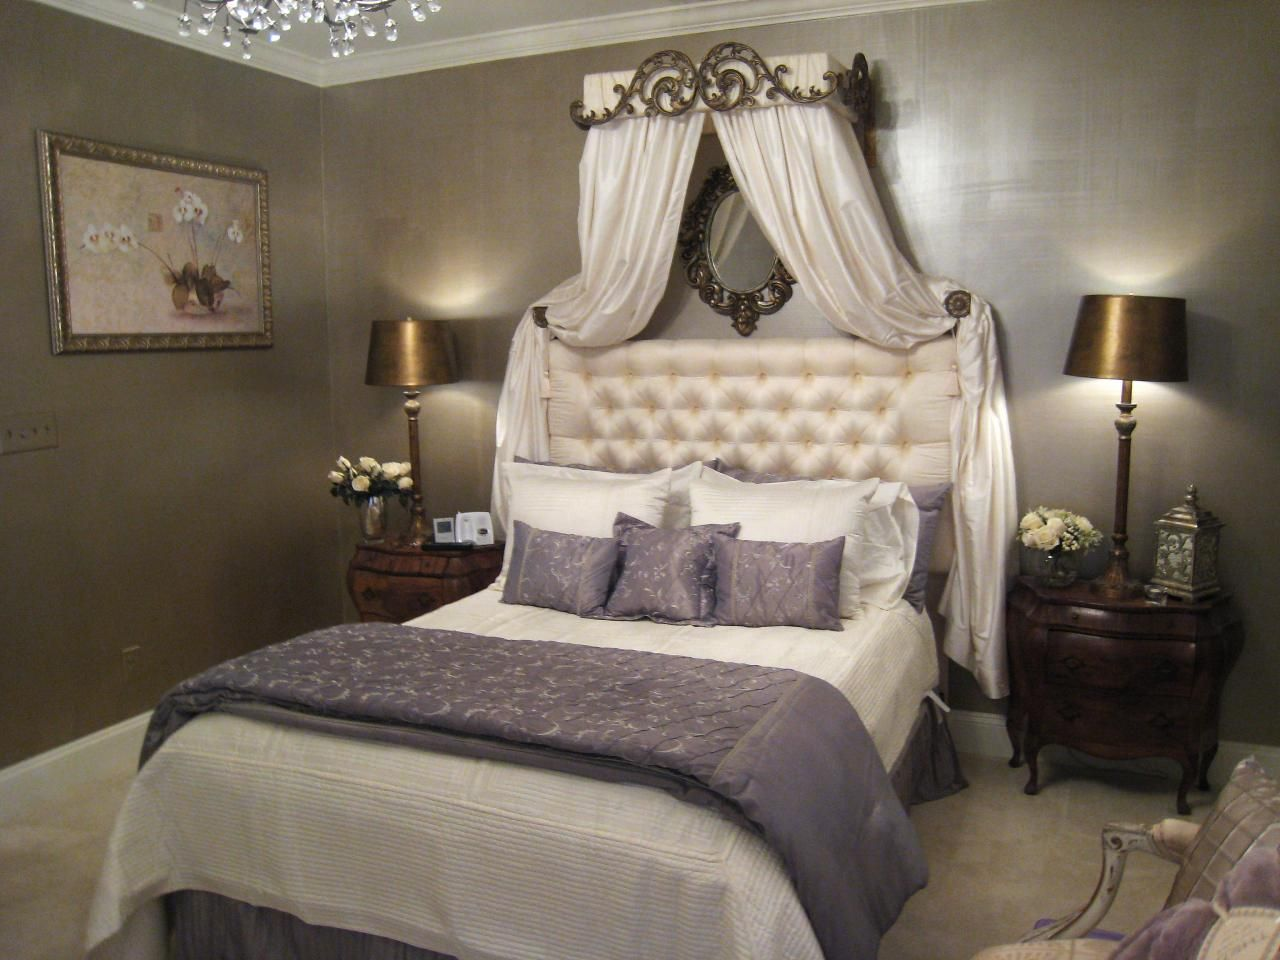 Bed Crown Design Ideas Home Bedroom Decor Bed Crown